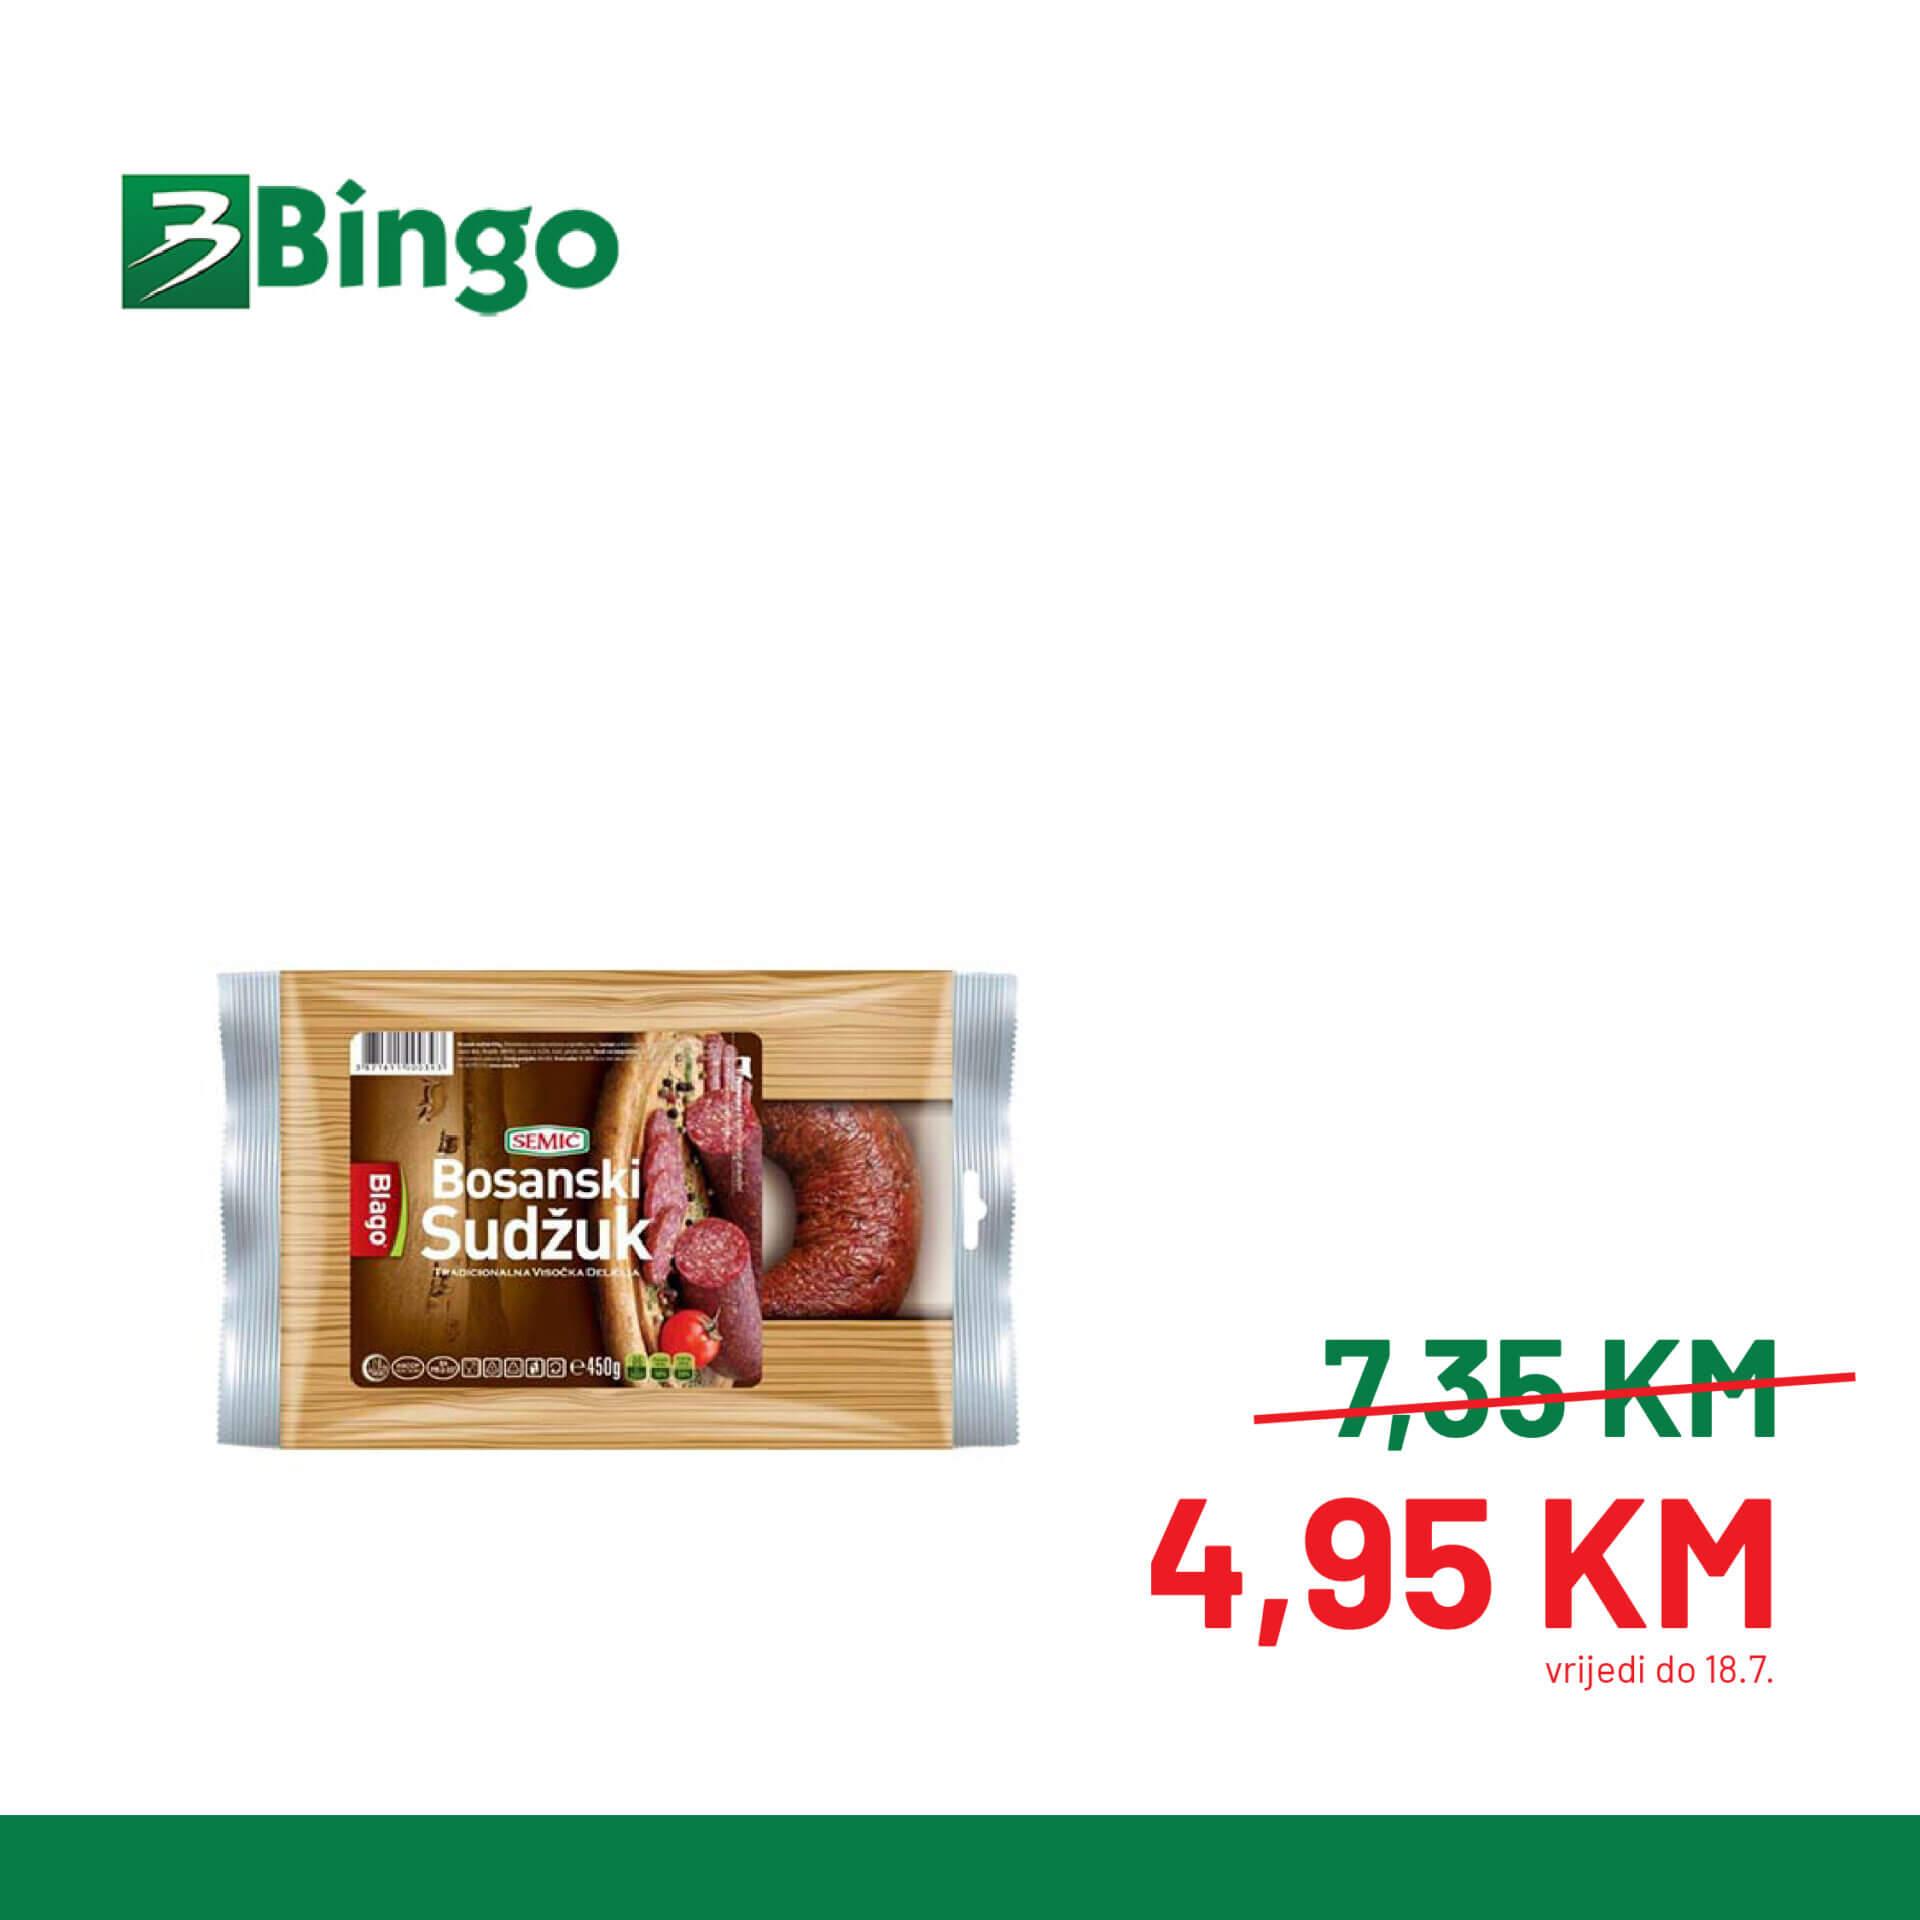 BINGO Katalog Super BINGO Ponude JUL 2021 10.7.2021. 18.7 3